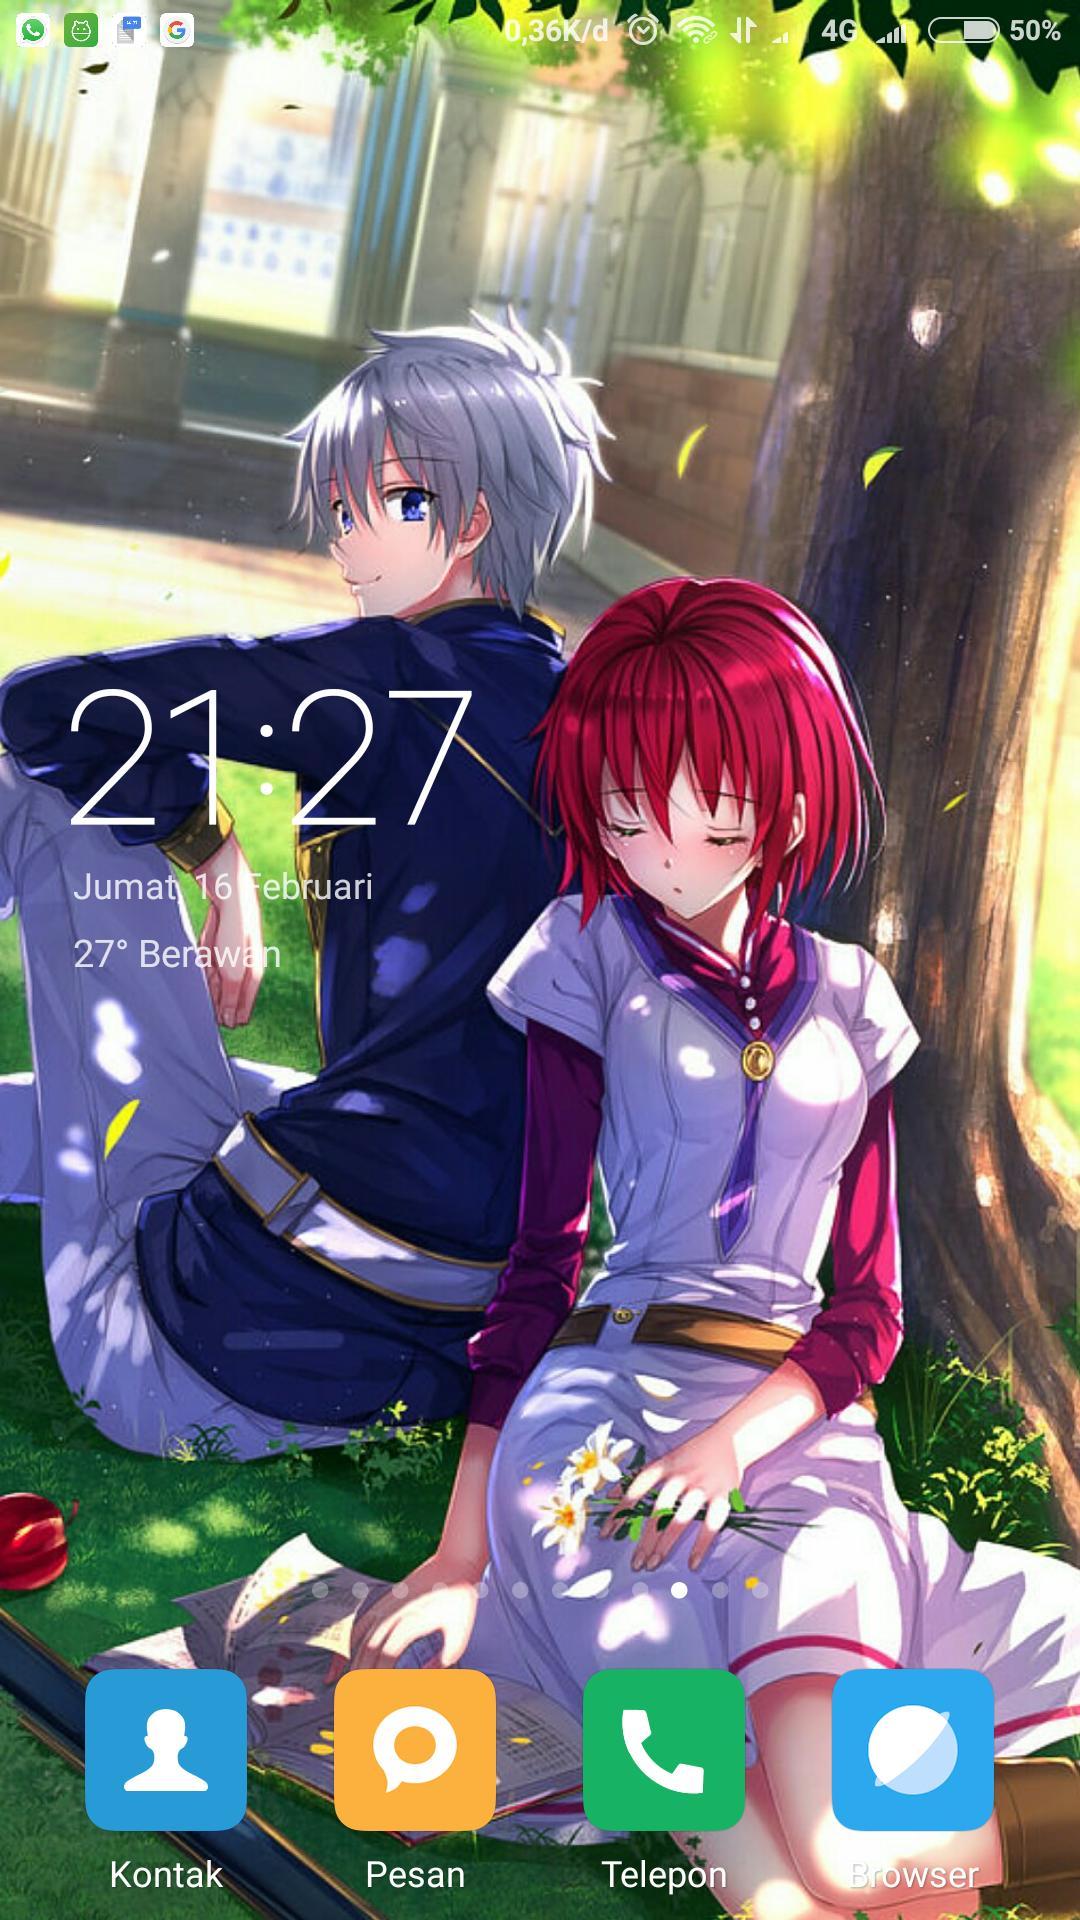 Wallpaper Akagami Shirayuki Hime Fansart For Android Apk Download